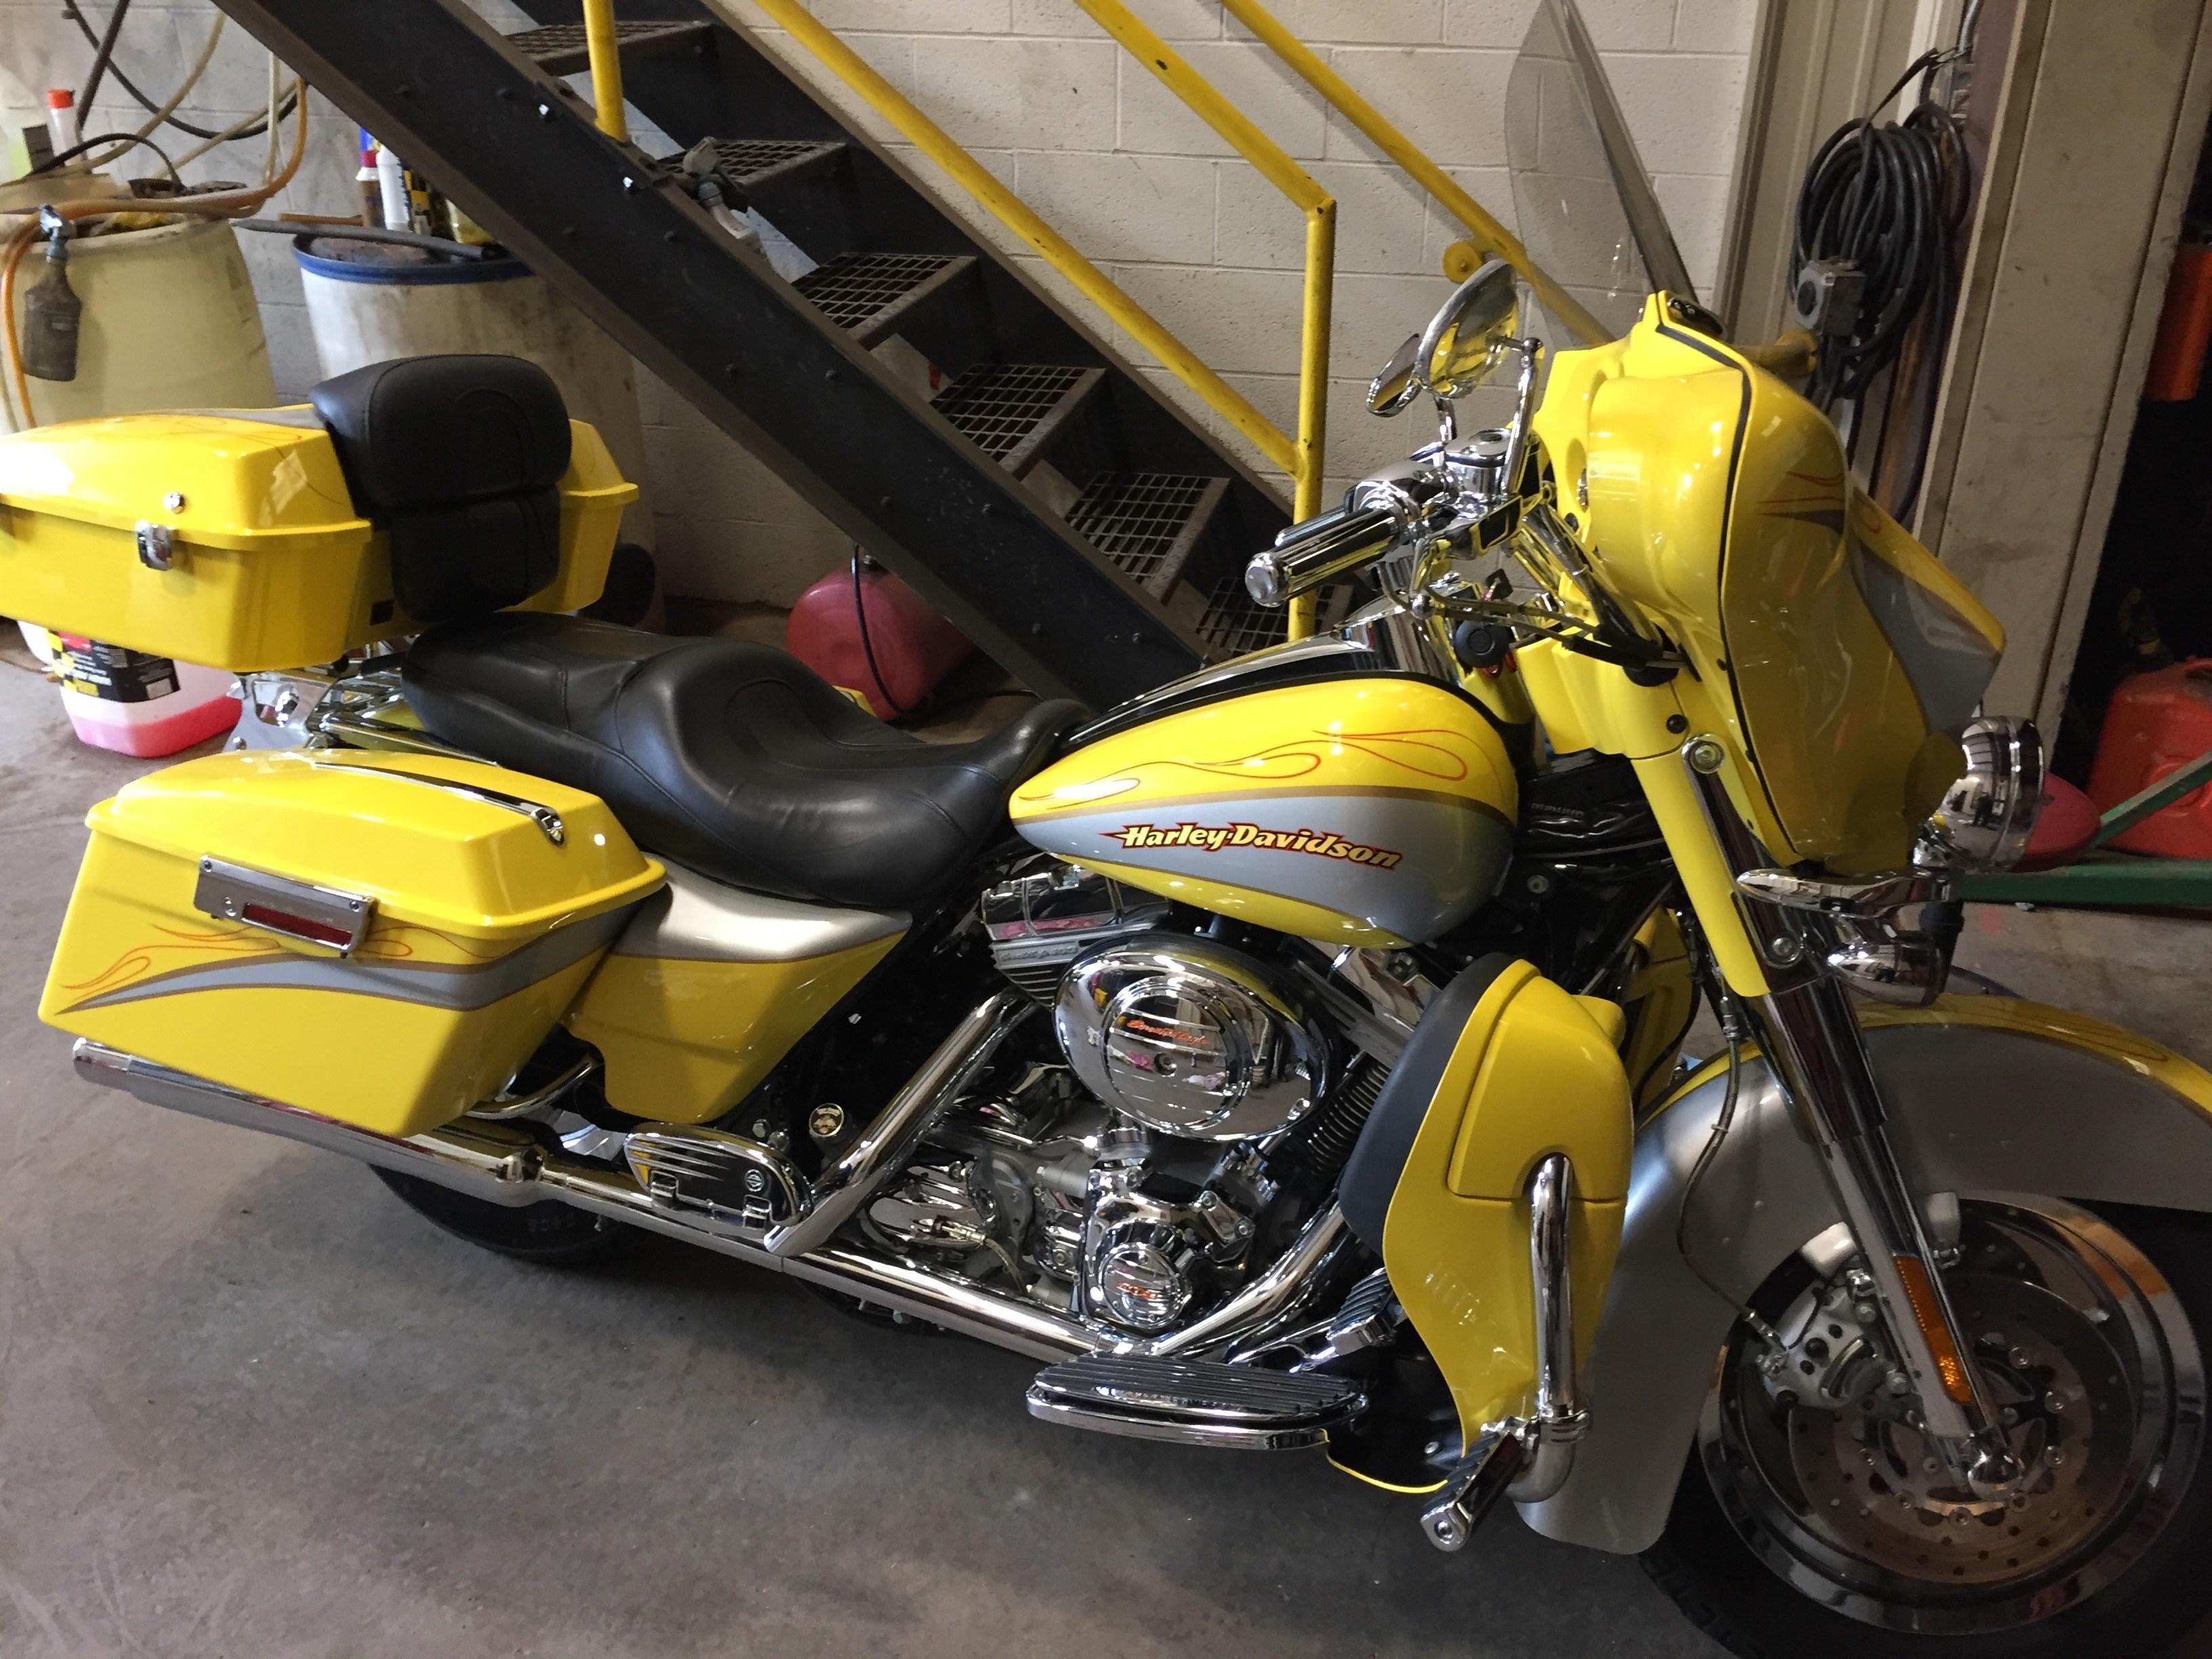 Cvo For Sale Pennsylvania >> 2005 Harley-Davidson® FLHTCSE2 Screamin' Eagle® Electra Glide® (Yellow / SILVER CVO BIKE ...